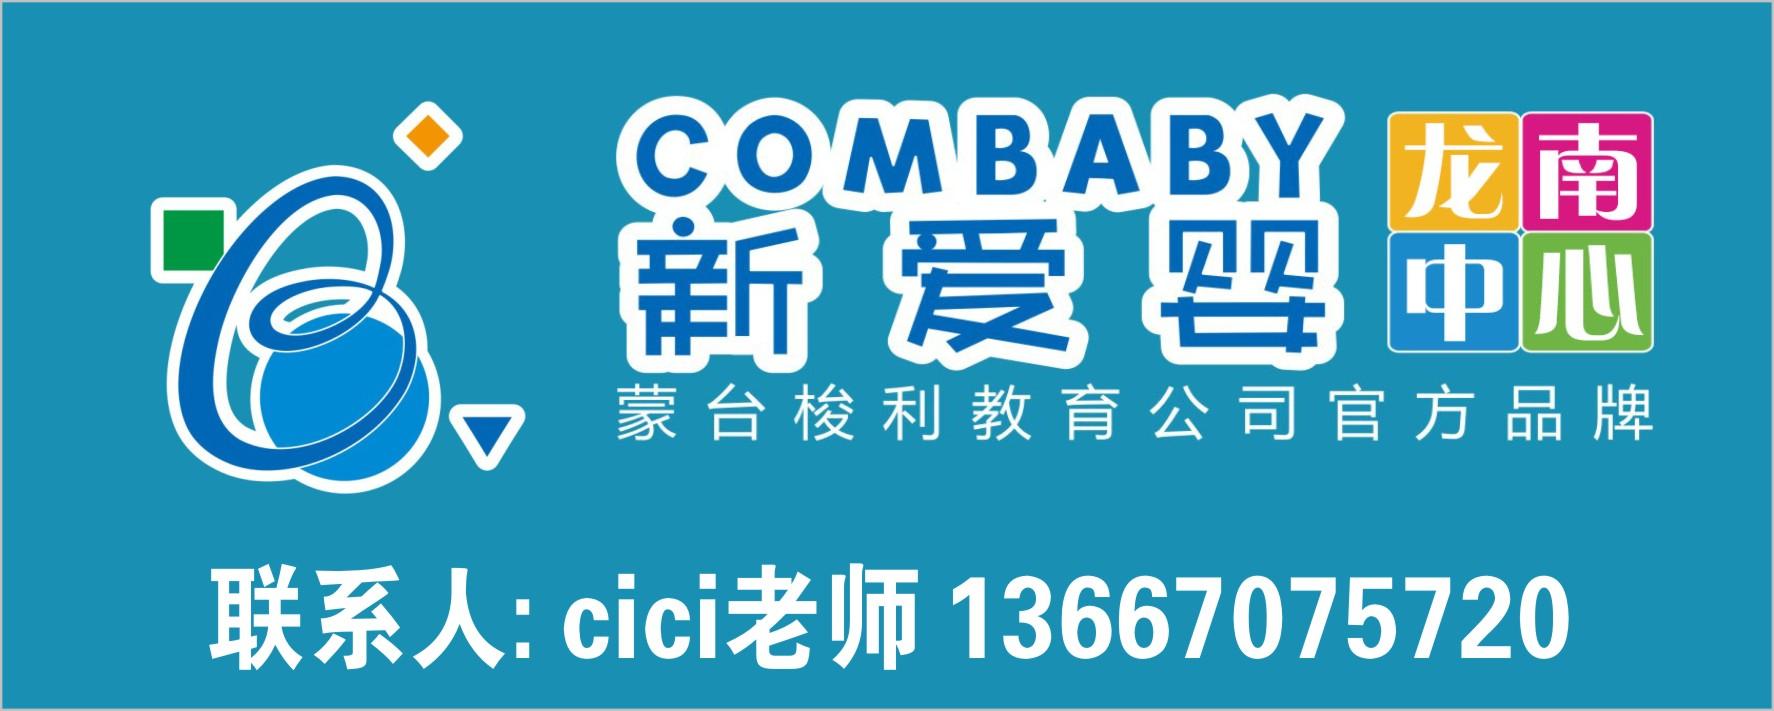 COMBABY新愛嬰龍南中心